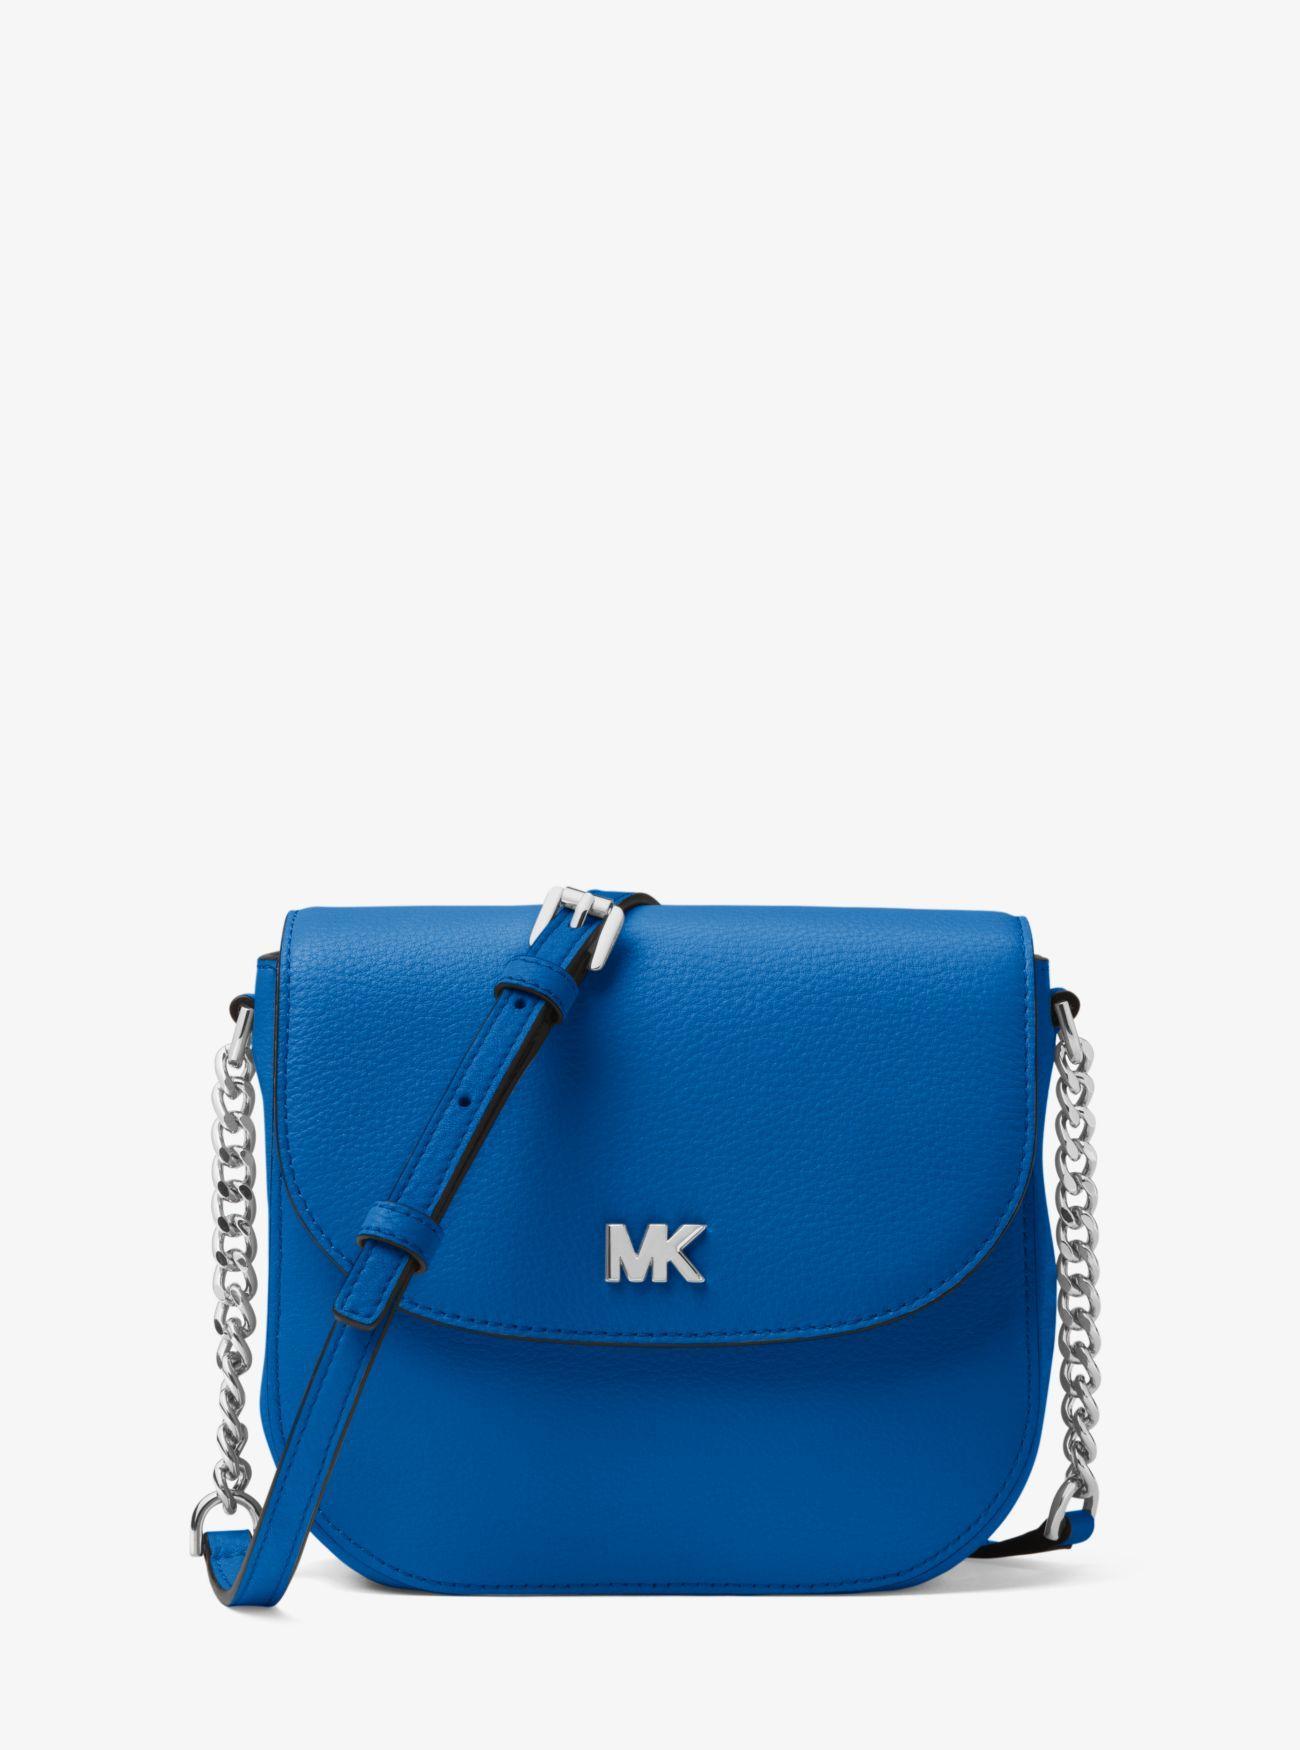 11cc6747c835 Lyst - MICHAEL Michael Kors Mott Leather Dome Crossbody Bag in Blue